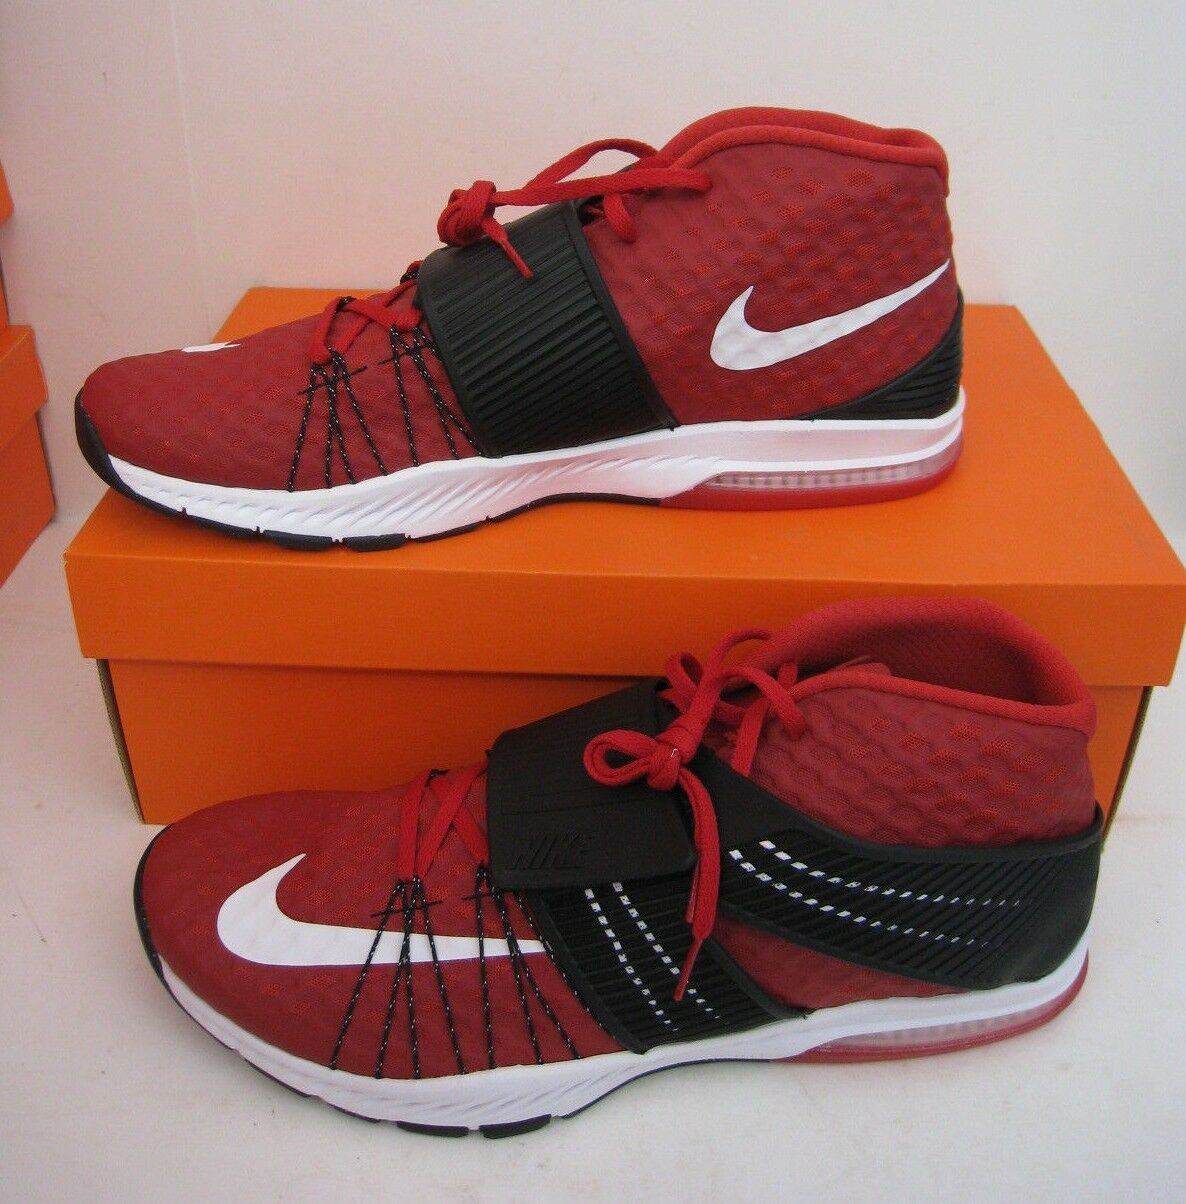 New Nike Zoom Train Toranada TB Training shoes Sneakers Gym Red   White & Black